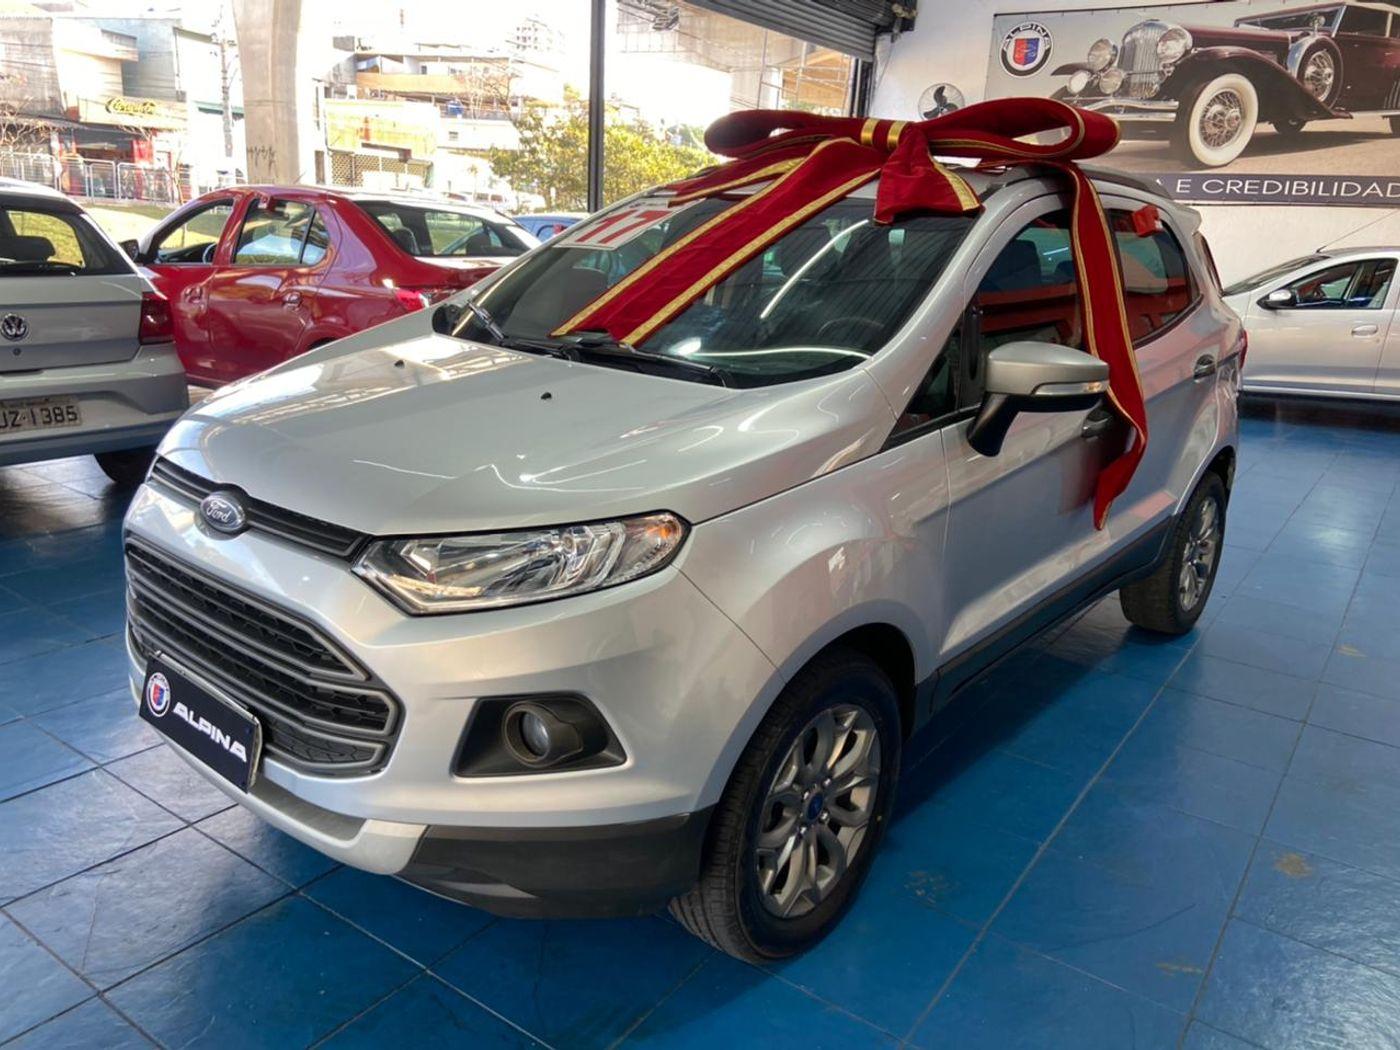 Ford EcoSport FREESTYLE 1.6 16V Flex 5p Aut.